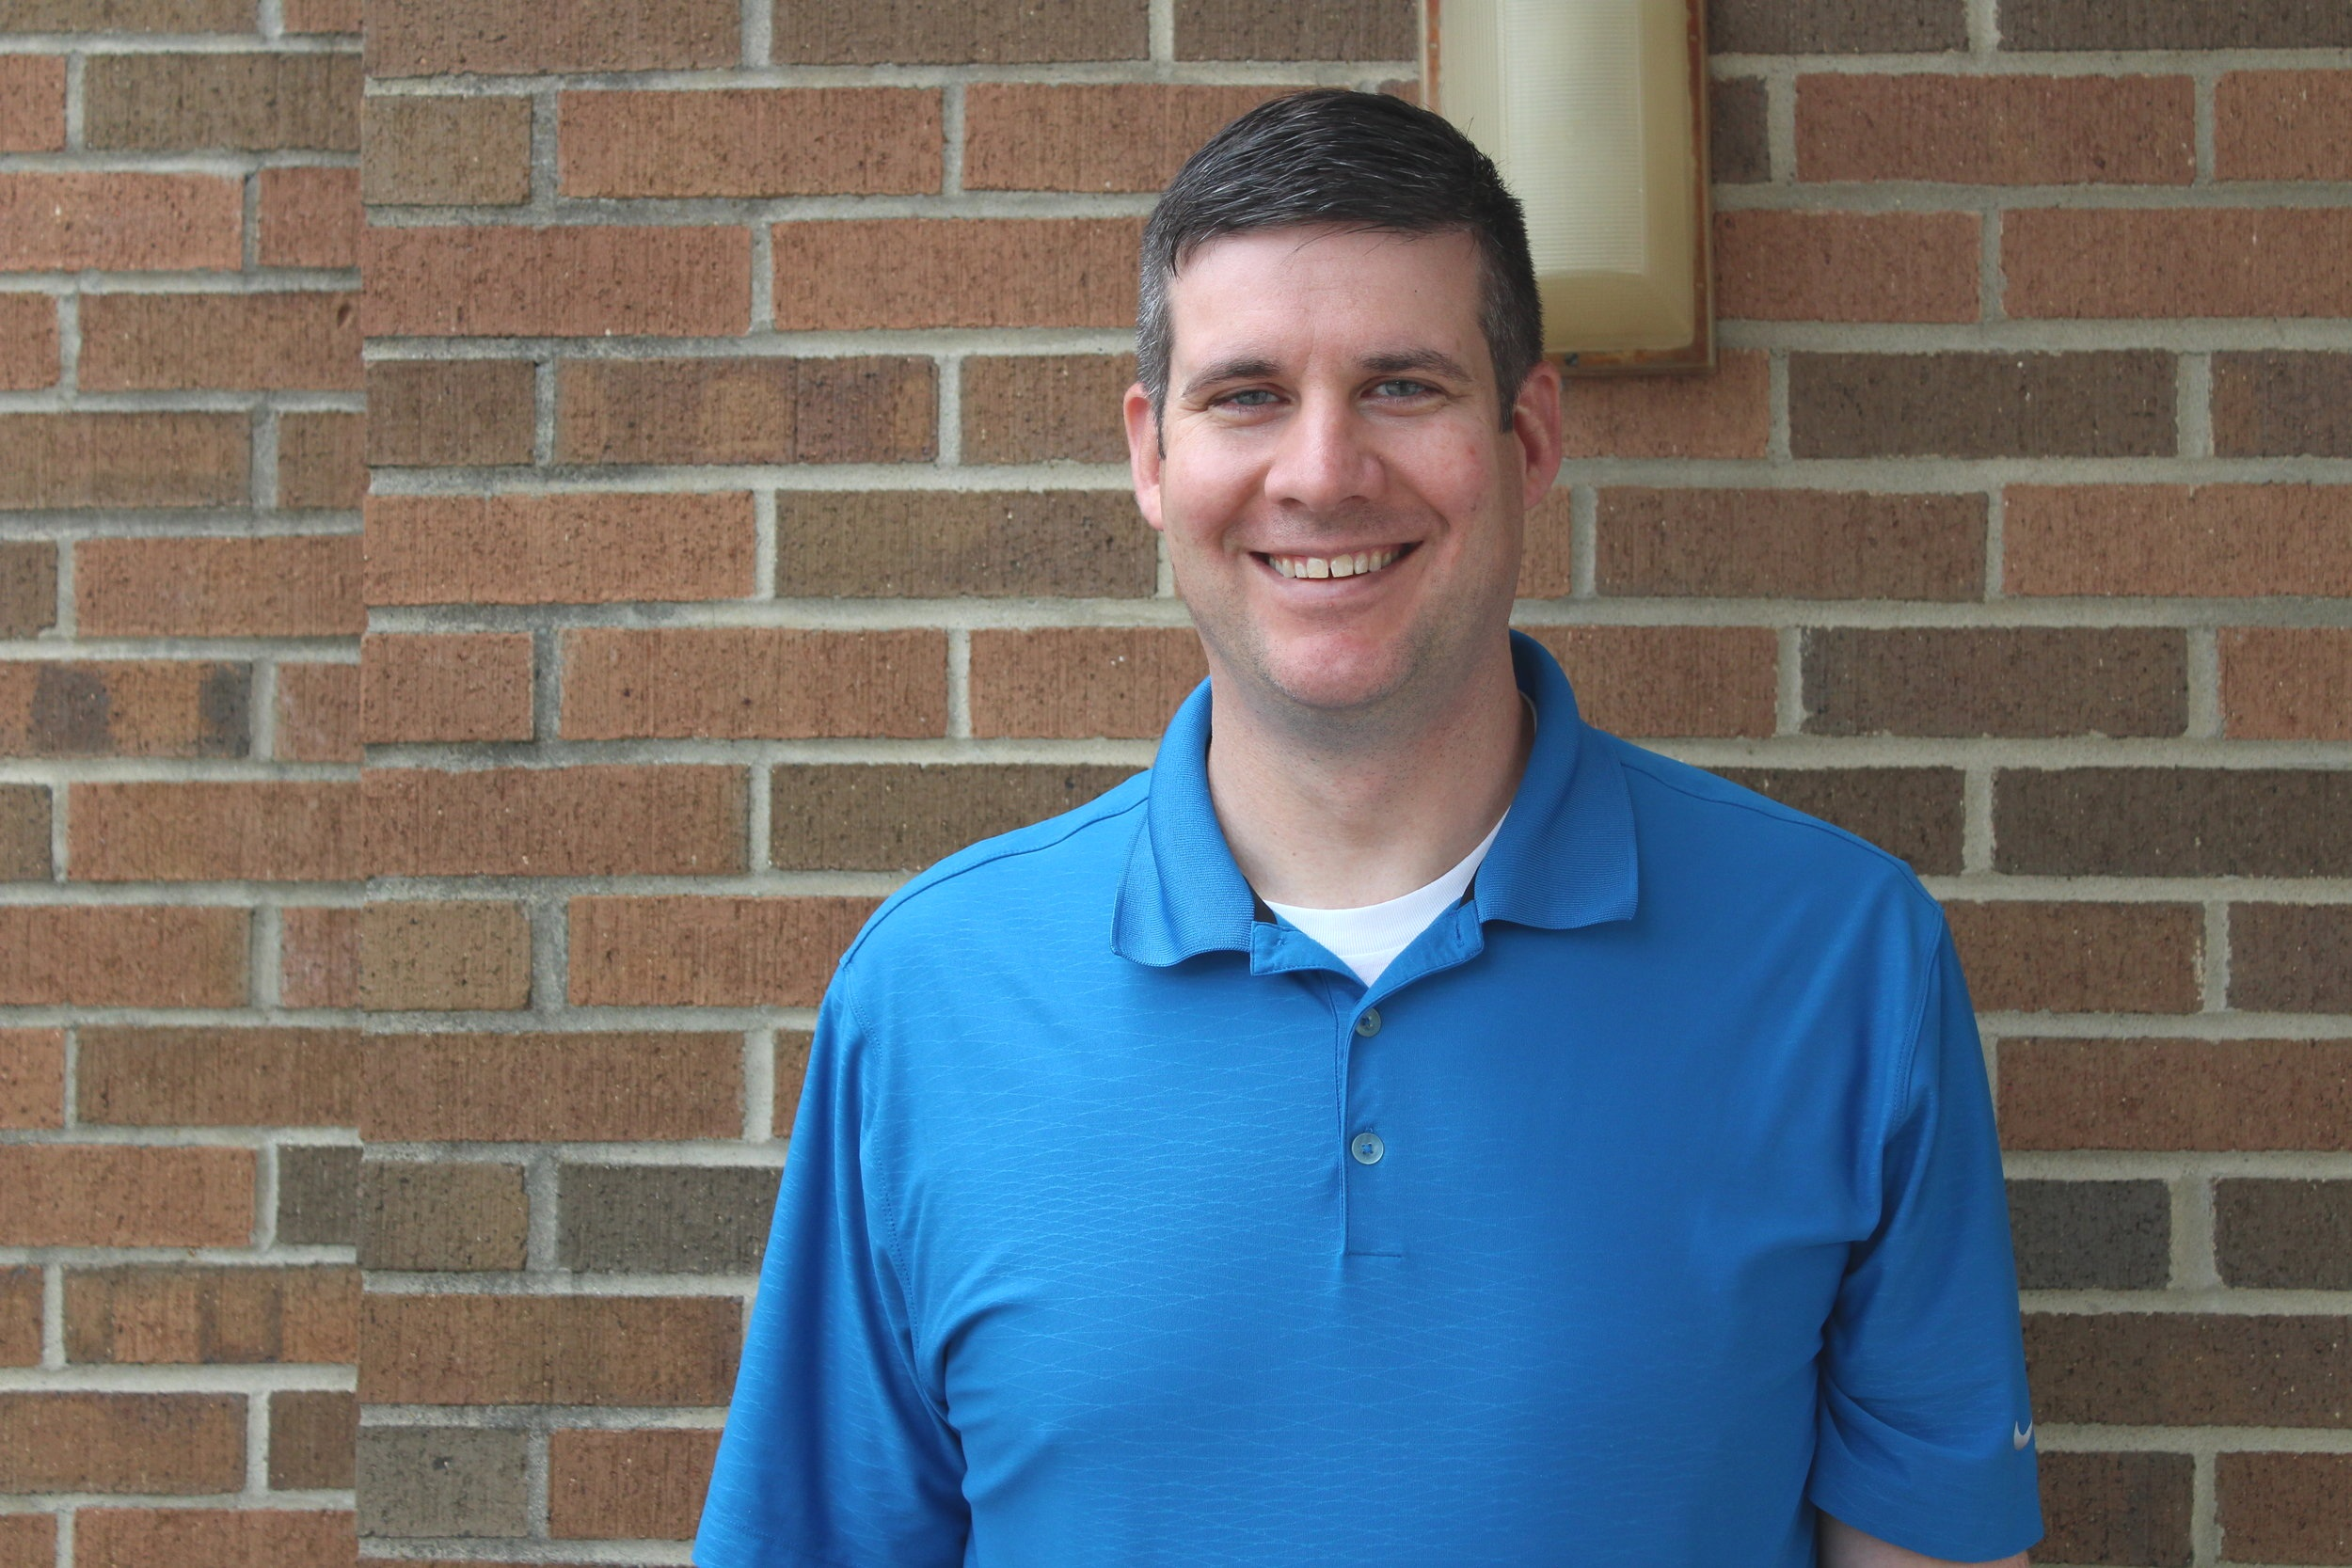 Jon Evans,Director of Children's Ministries -